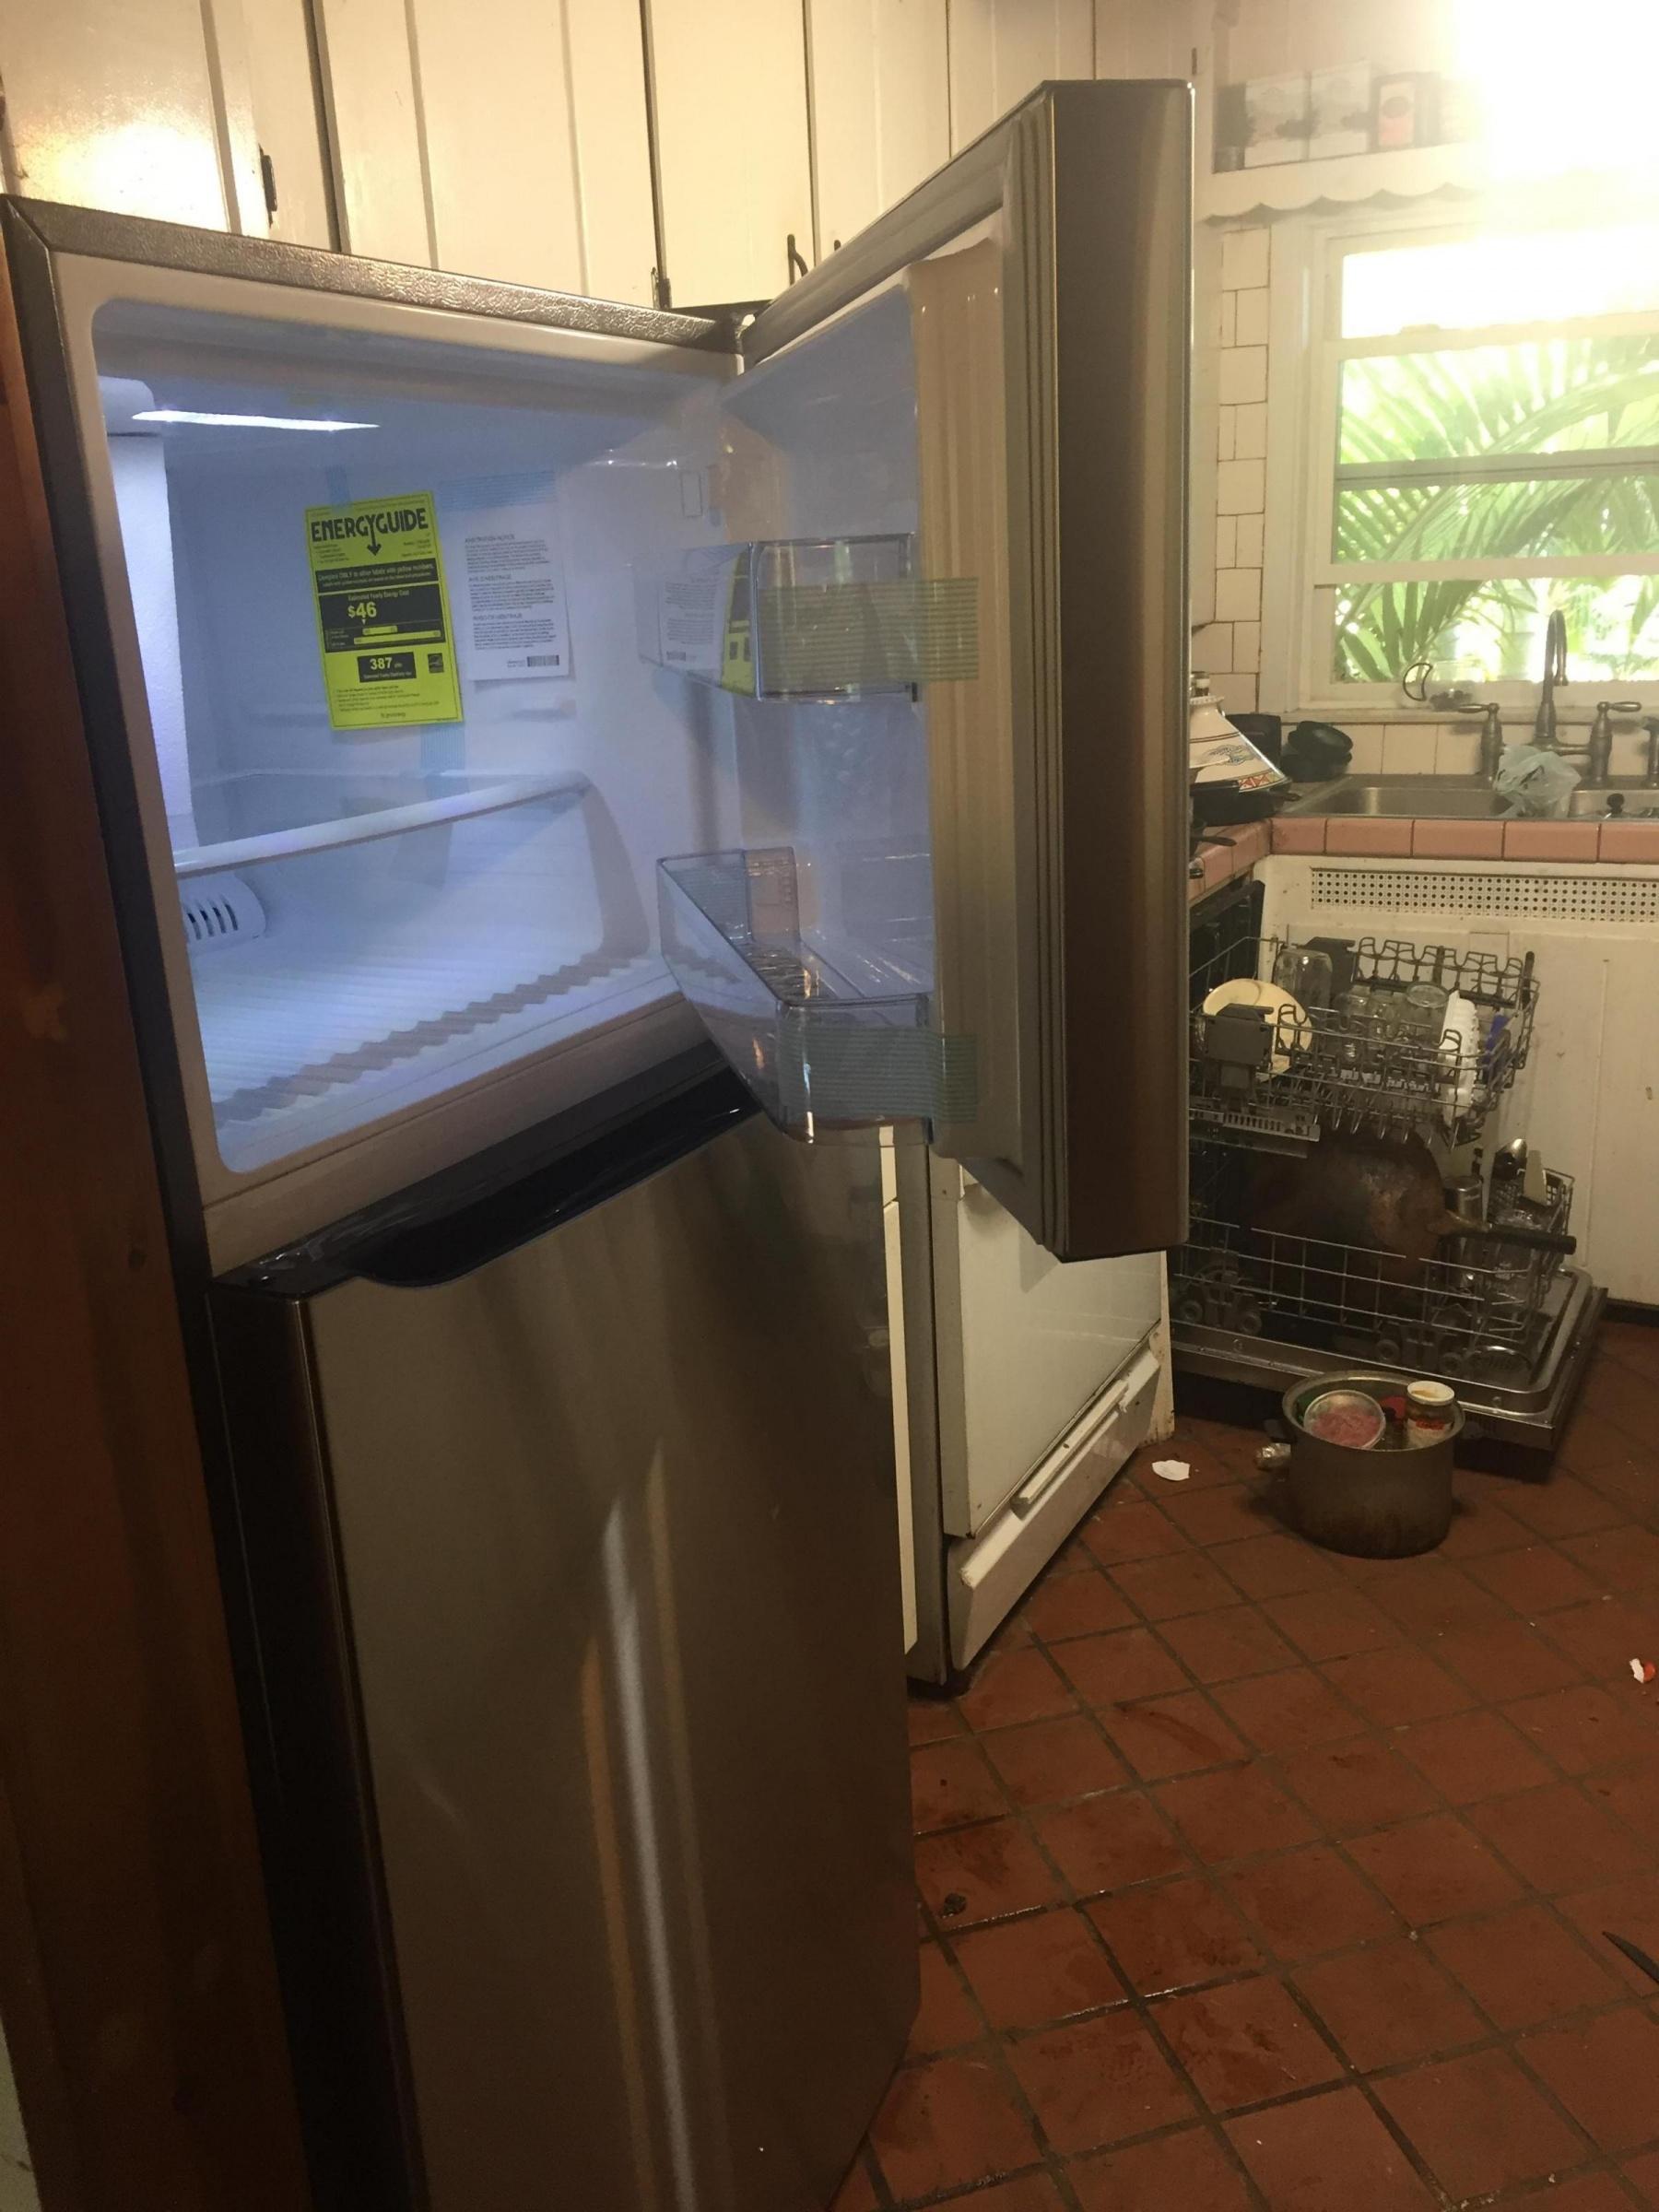 GE Fridge Won't Get Cold Enough - Appliances - DIY ...